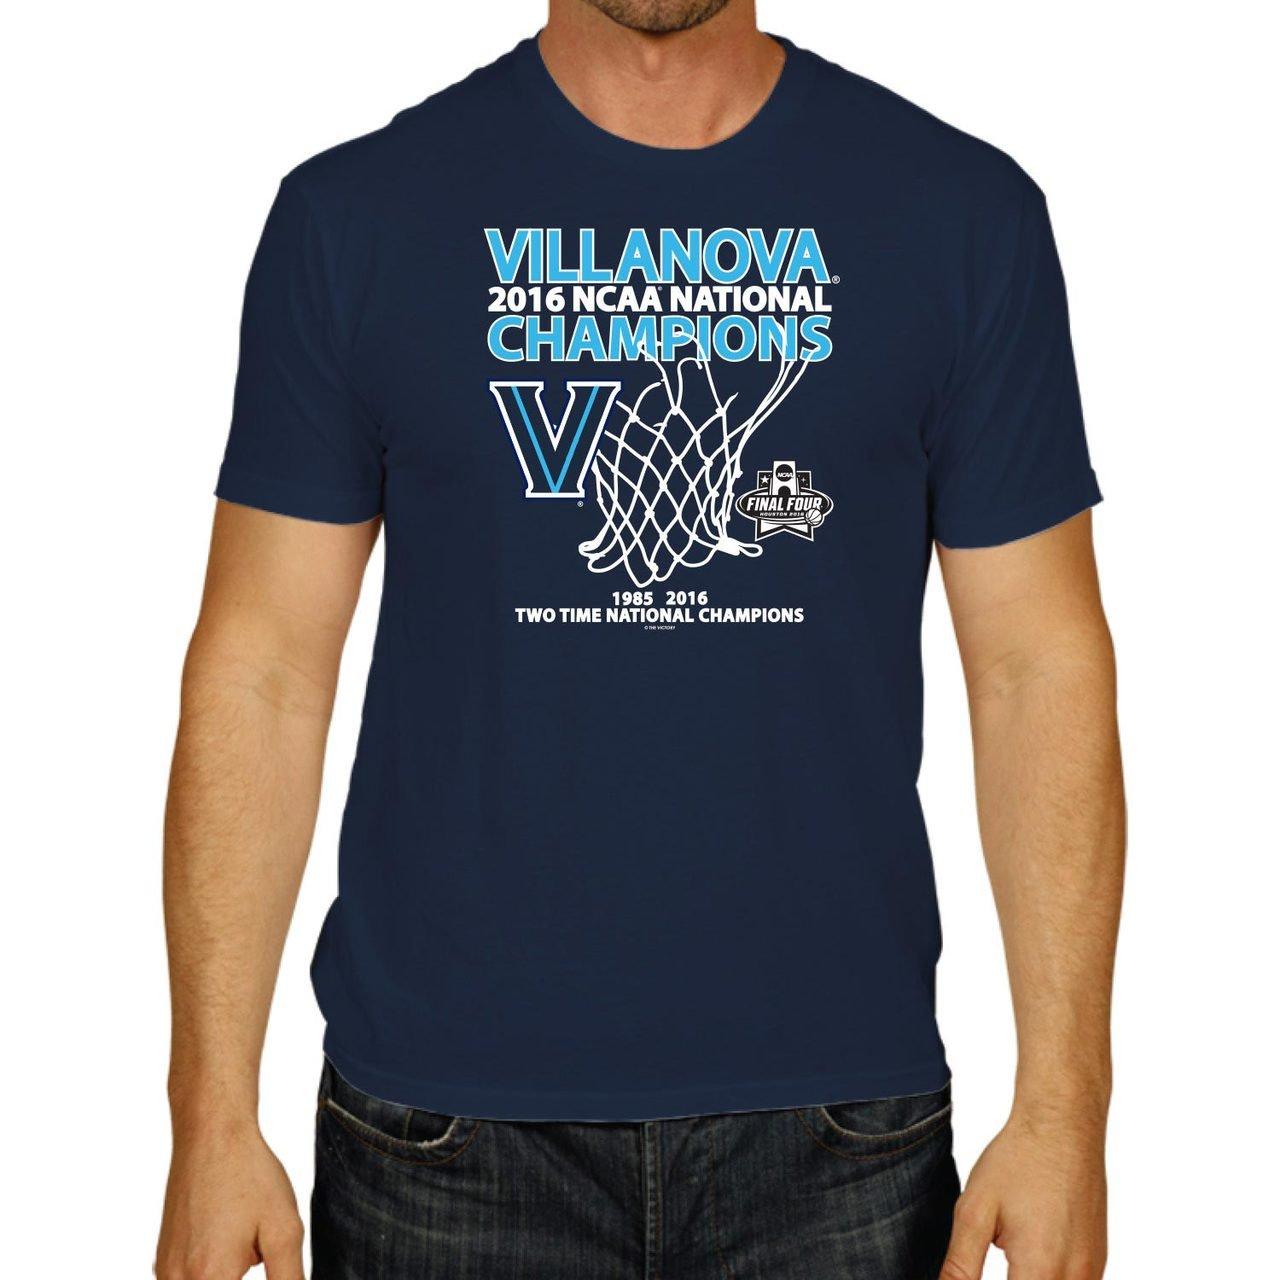 Villanova Wildcats 2016 National Champions camiseta - Azul marino ...